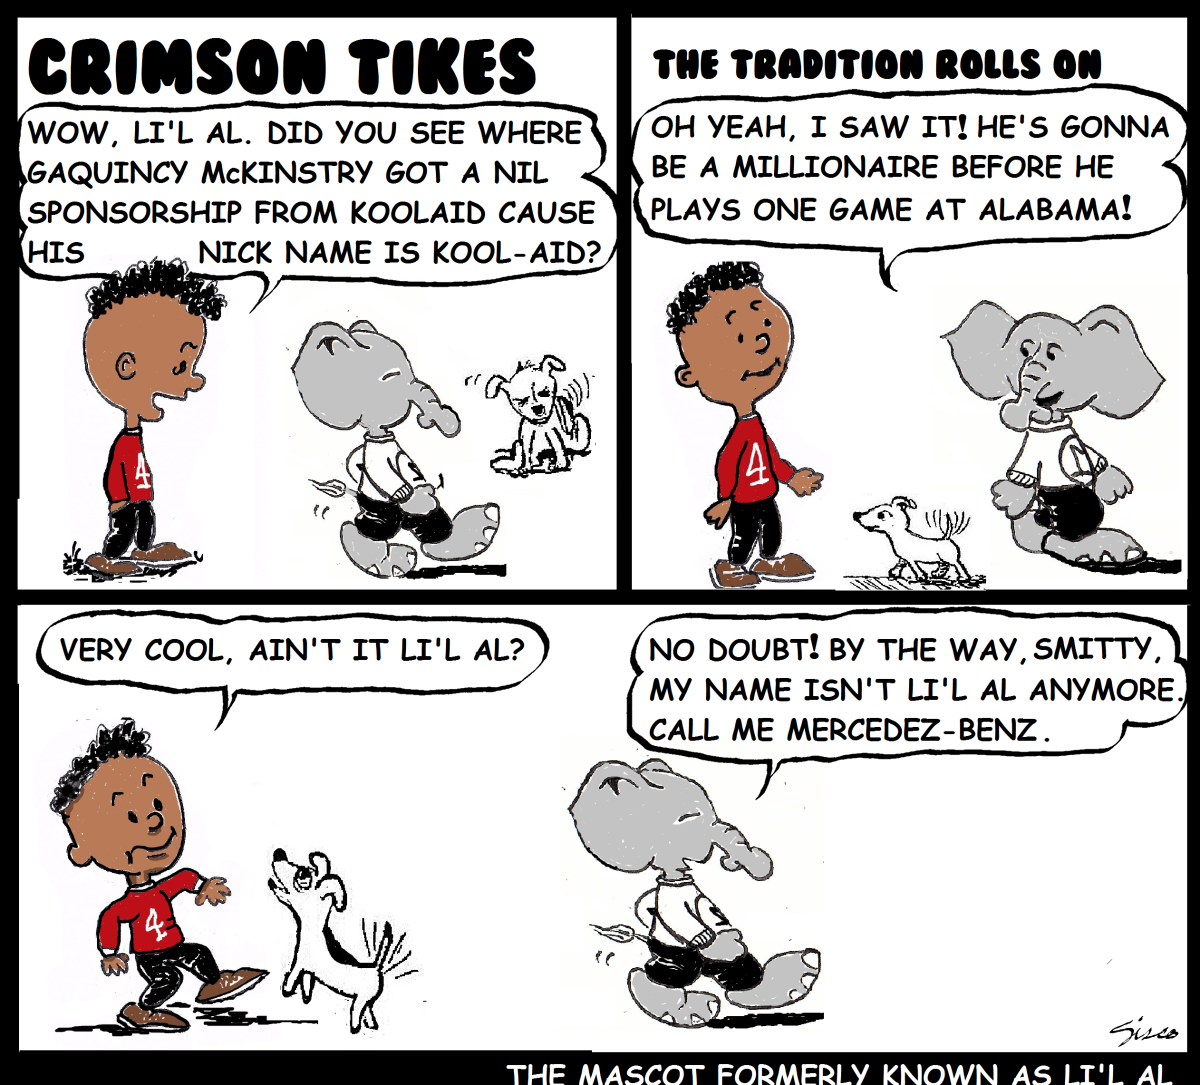 Crimson Tikes: The Artist Formally Known as Li'L Al